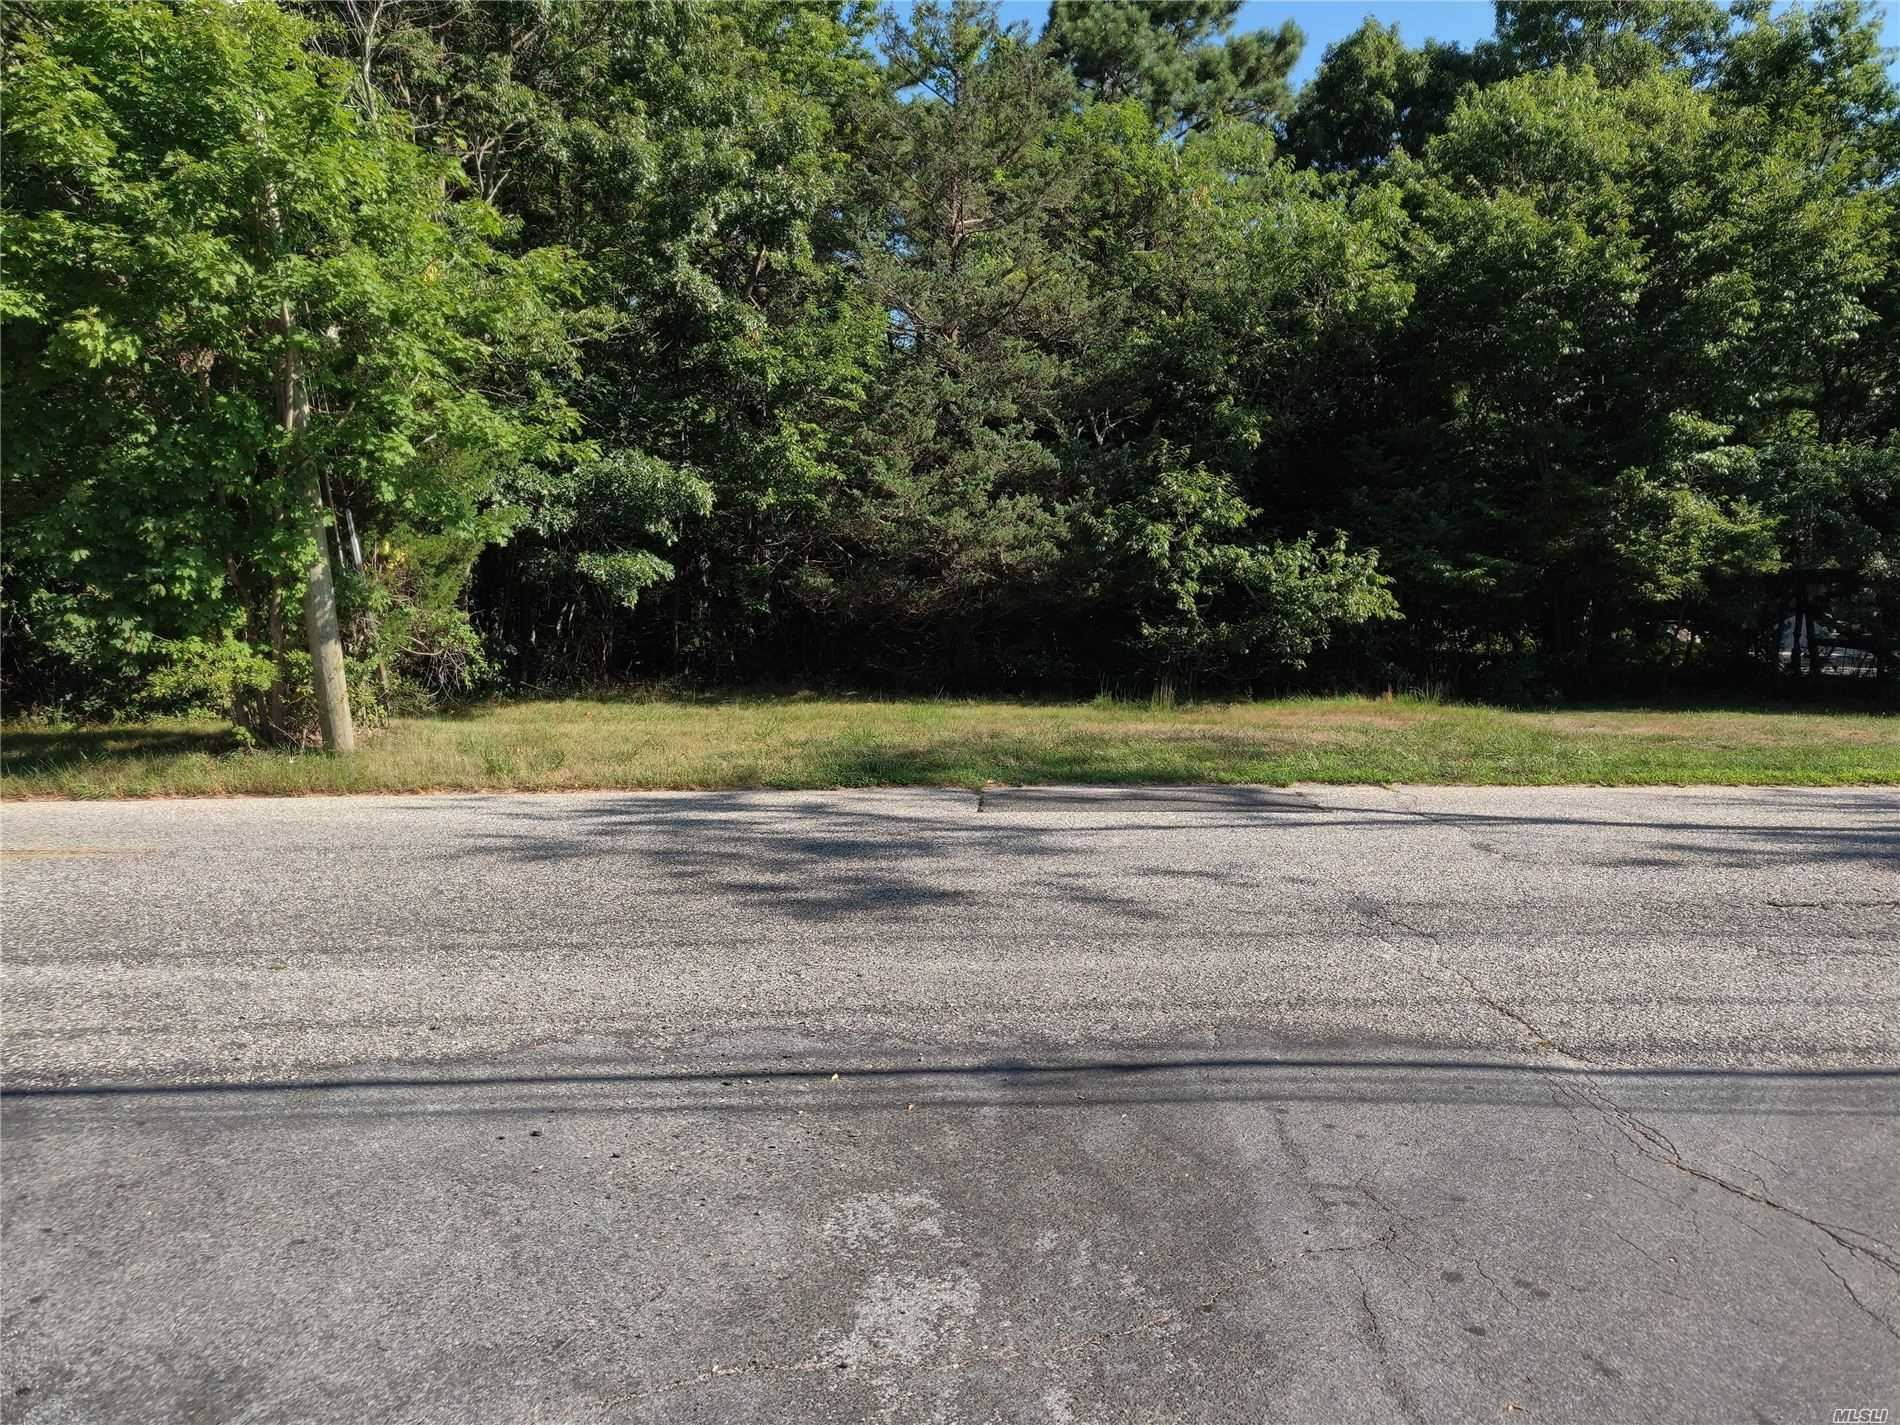 Lot 2 Barton Ave, Patchogue, NY 11772 - MLS#: 3237733